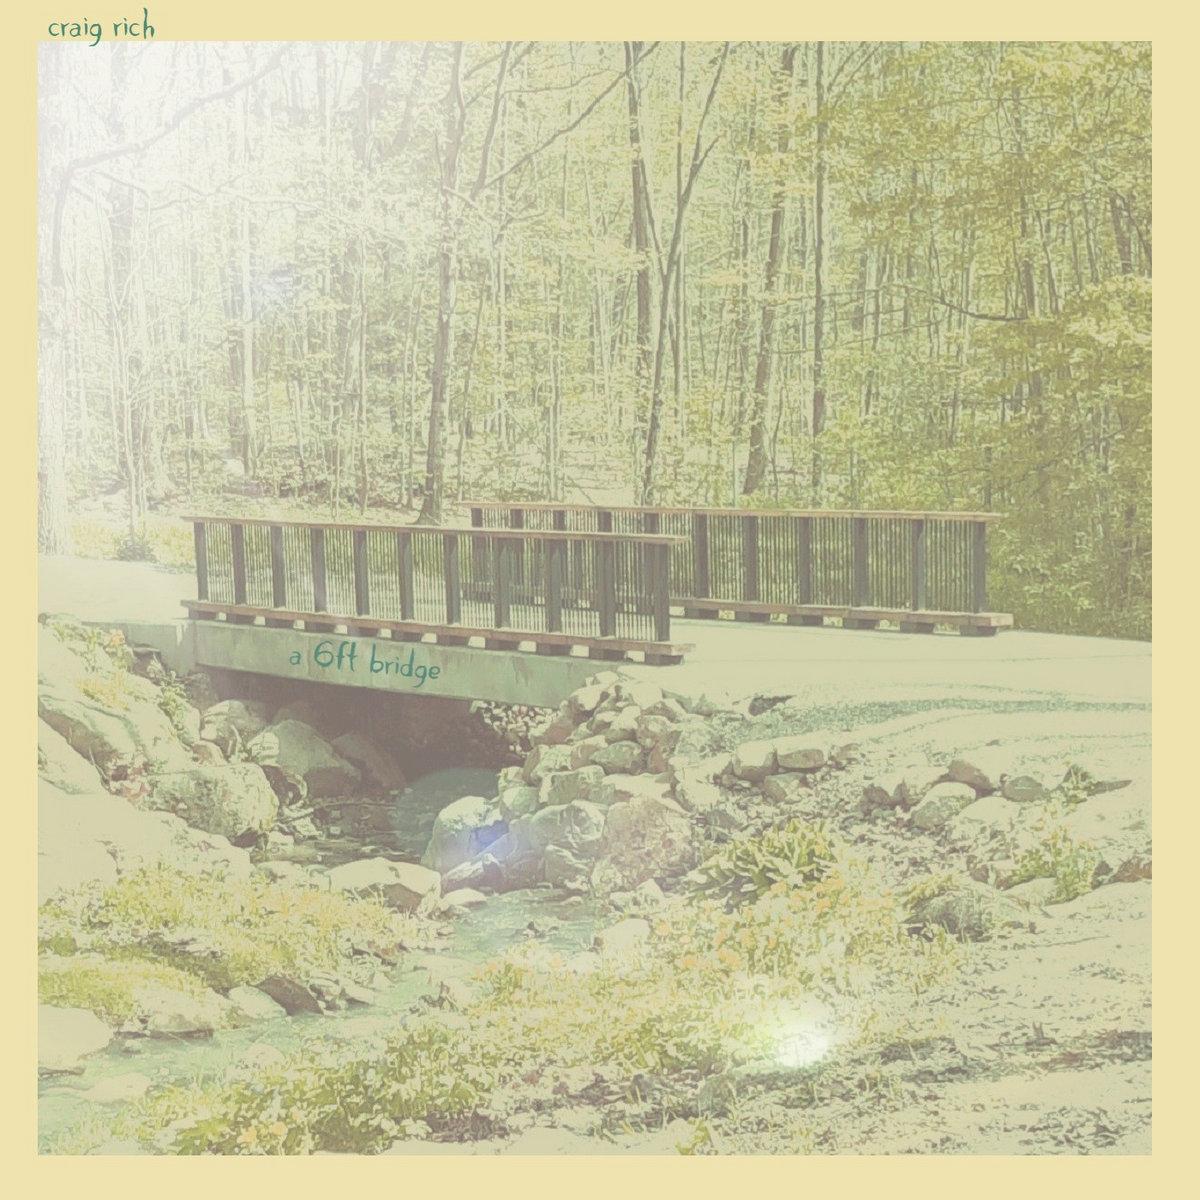 A 6ft Bridge by Craig Rich